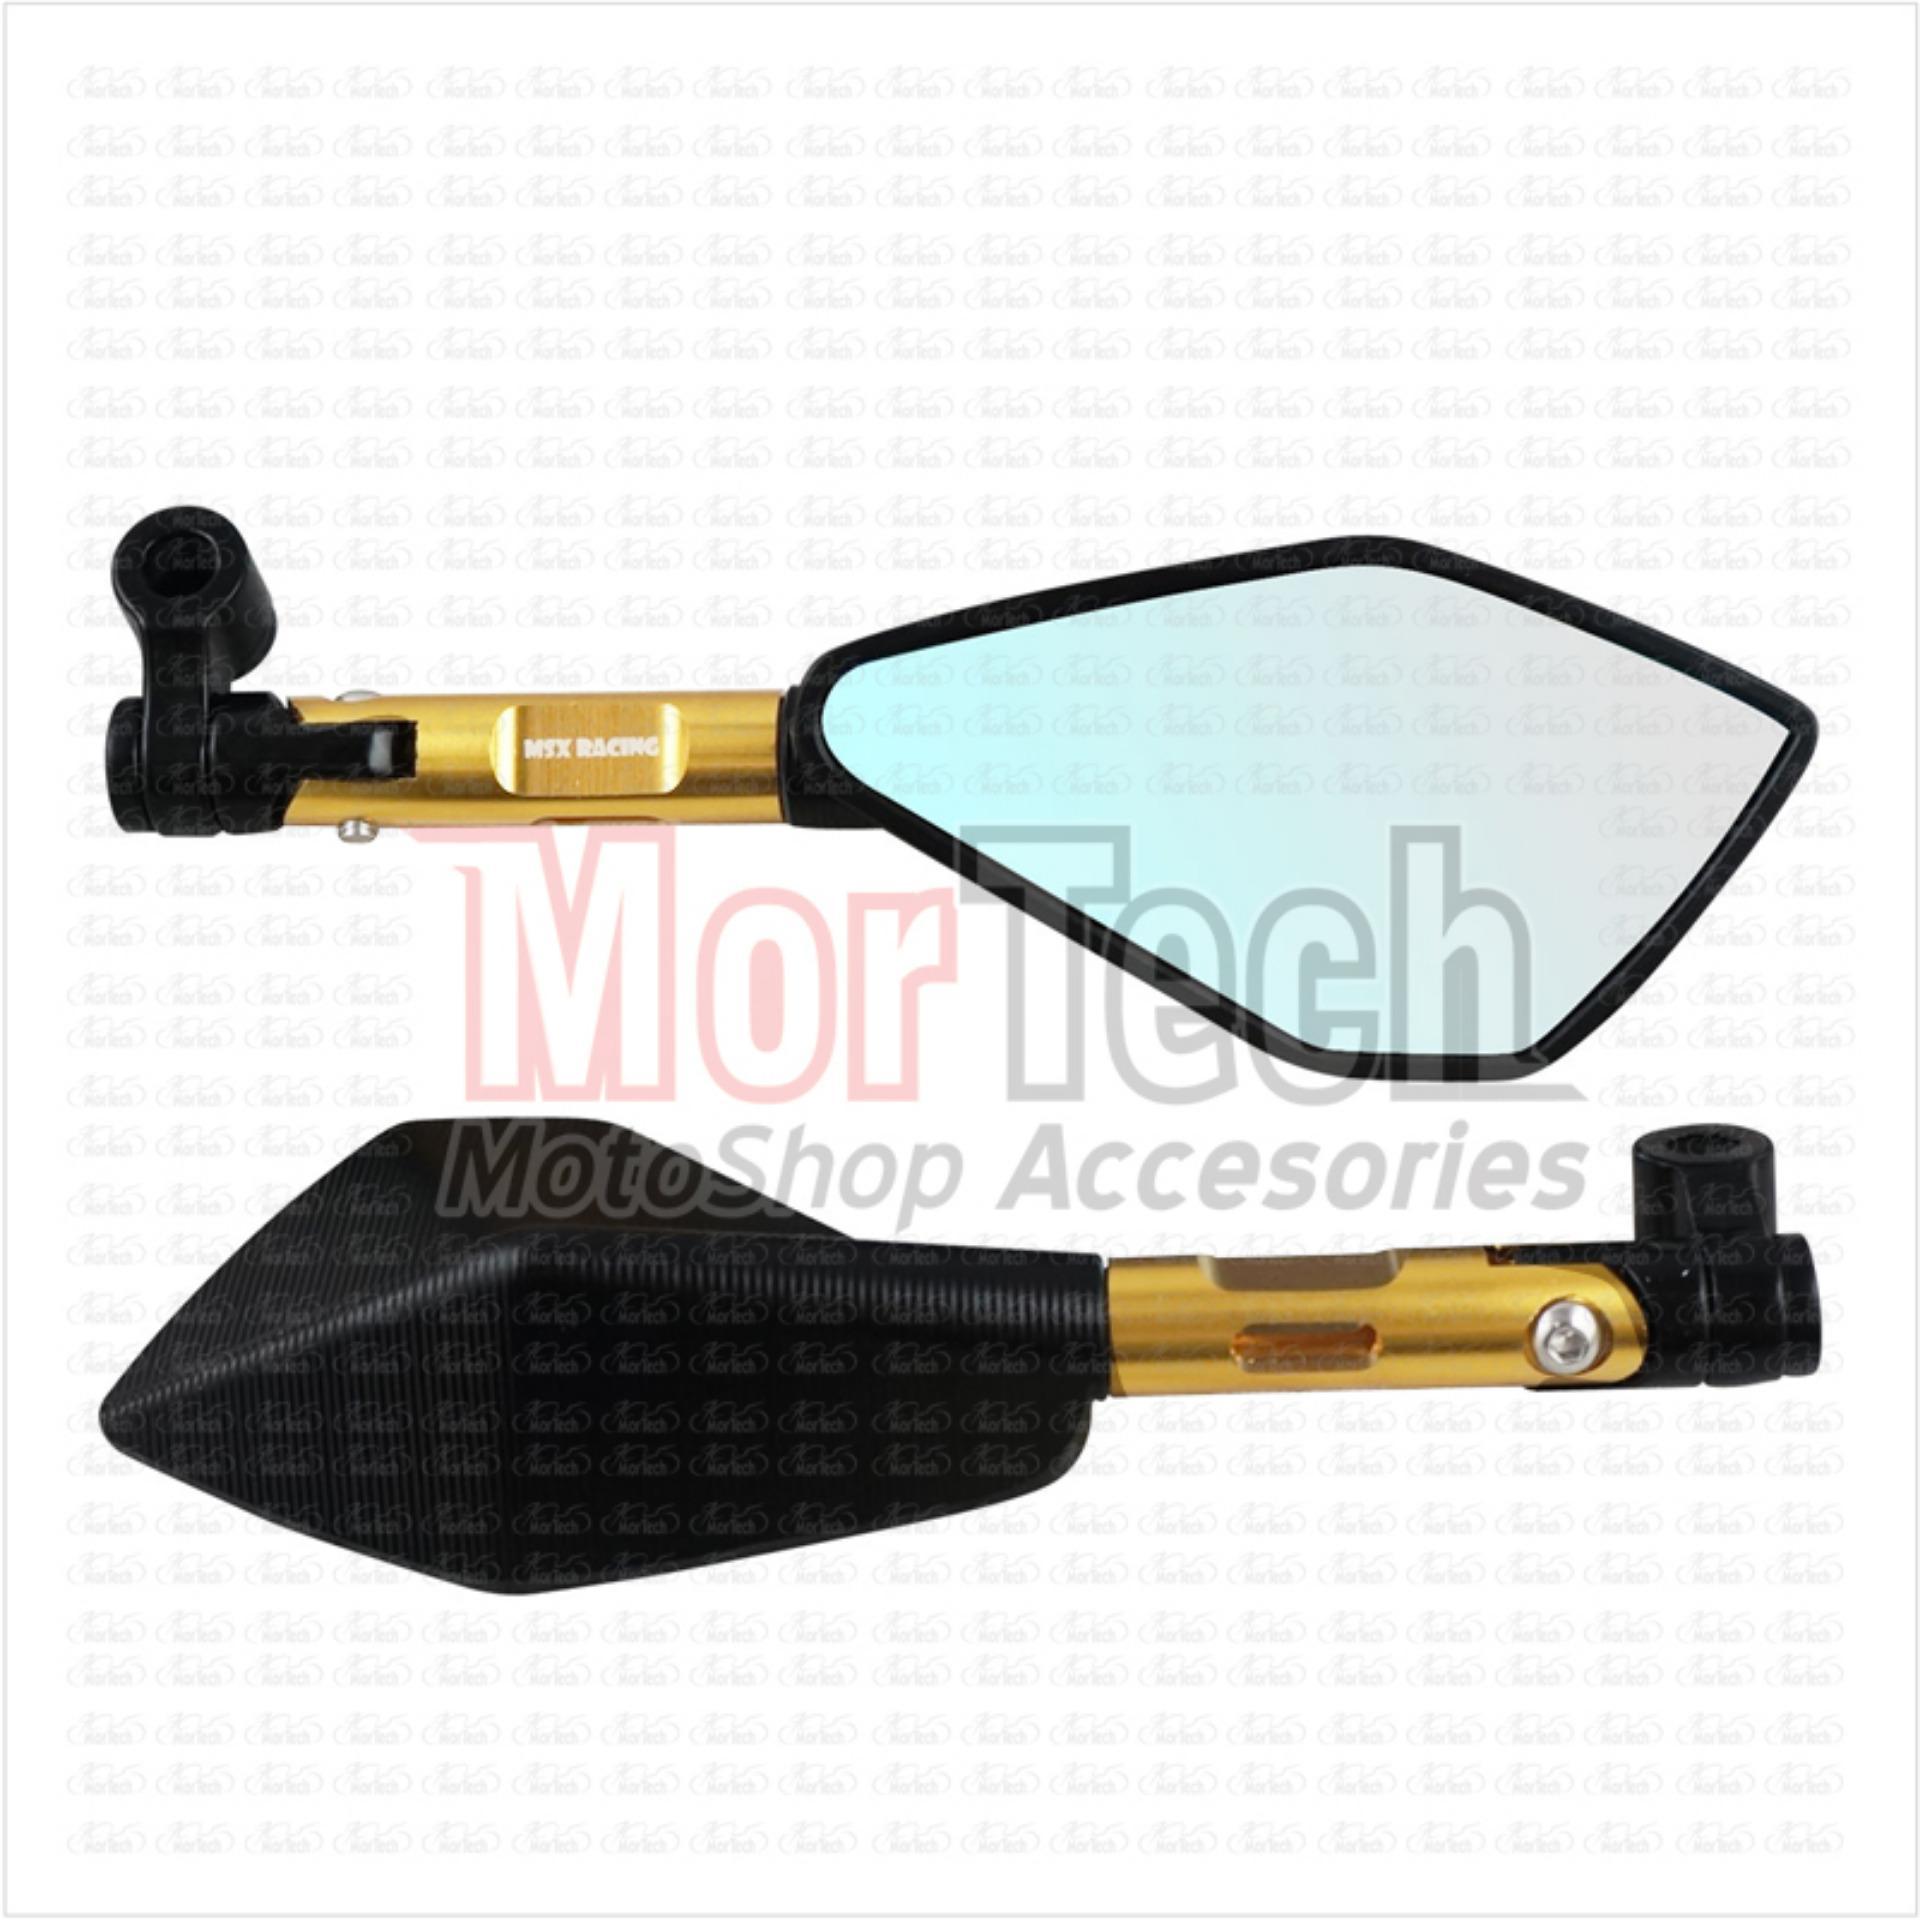 MSX Kaca Spion Sepion Vixion Fairing Tomok Jumbo CNC - Gold